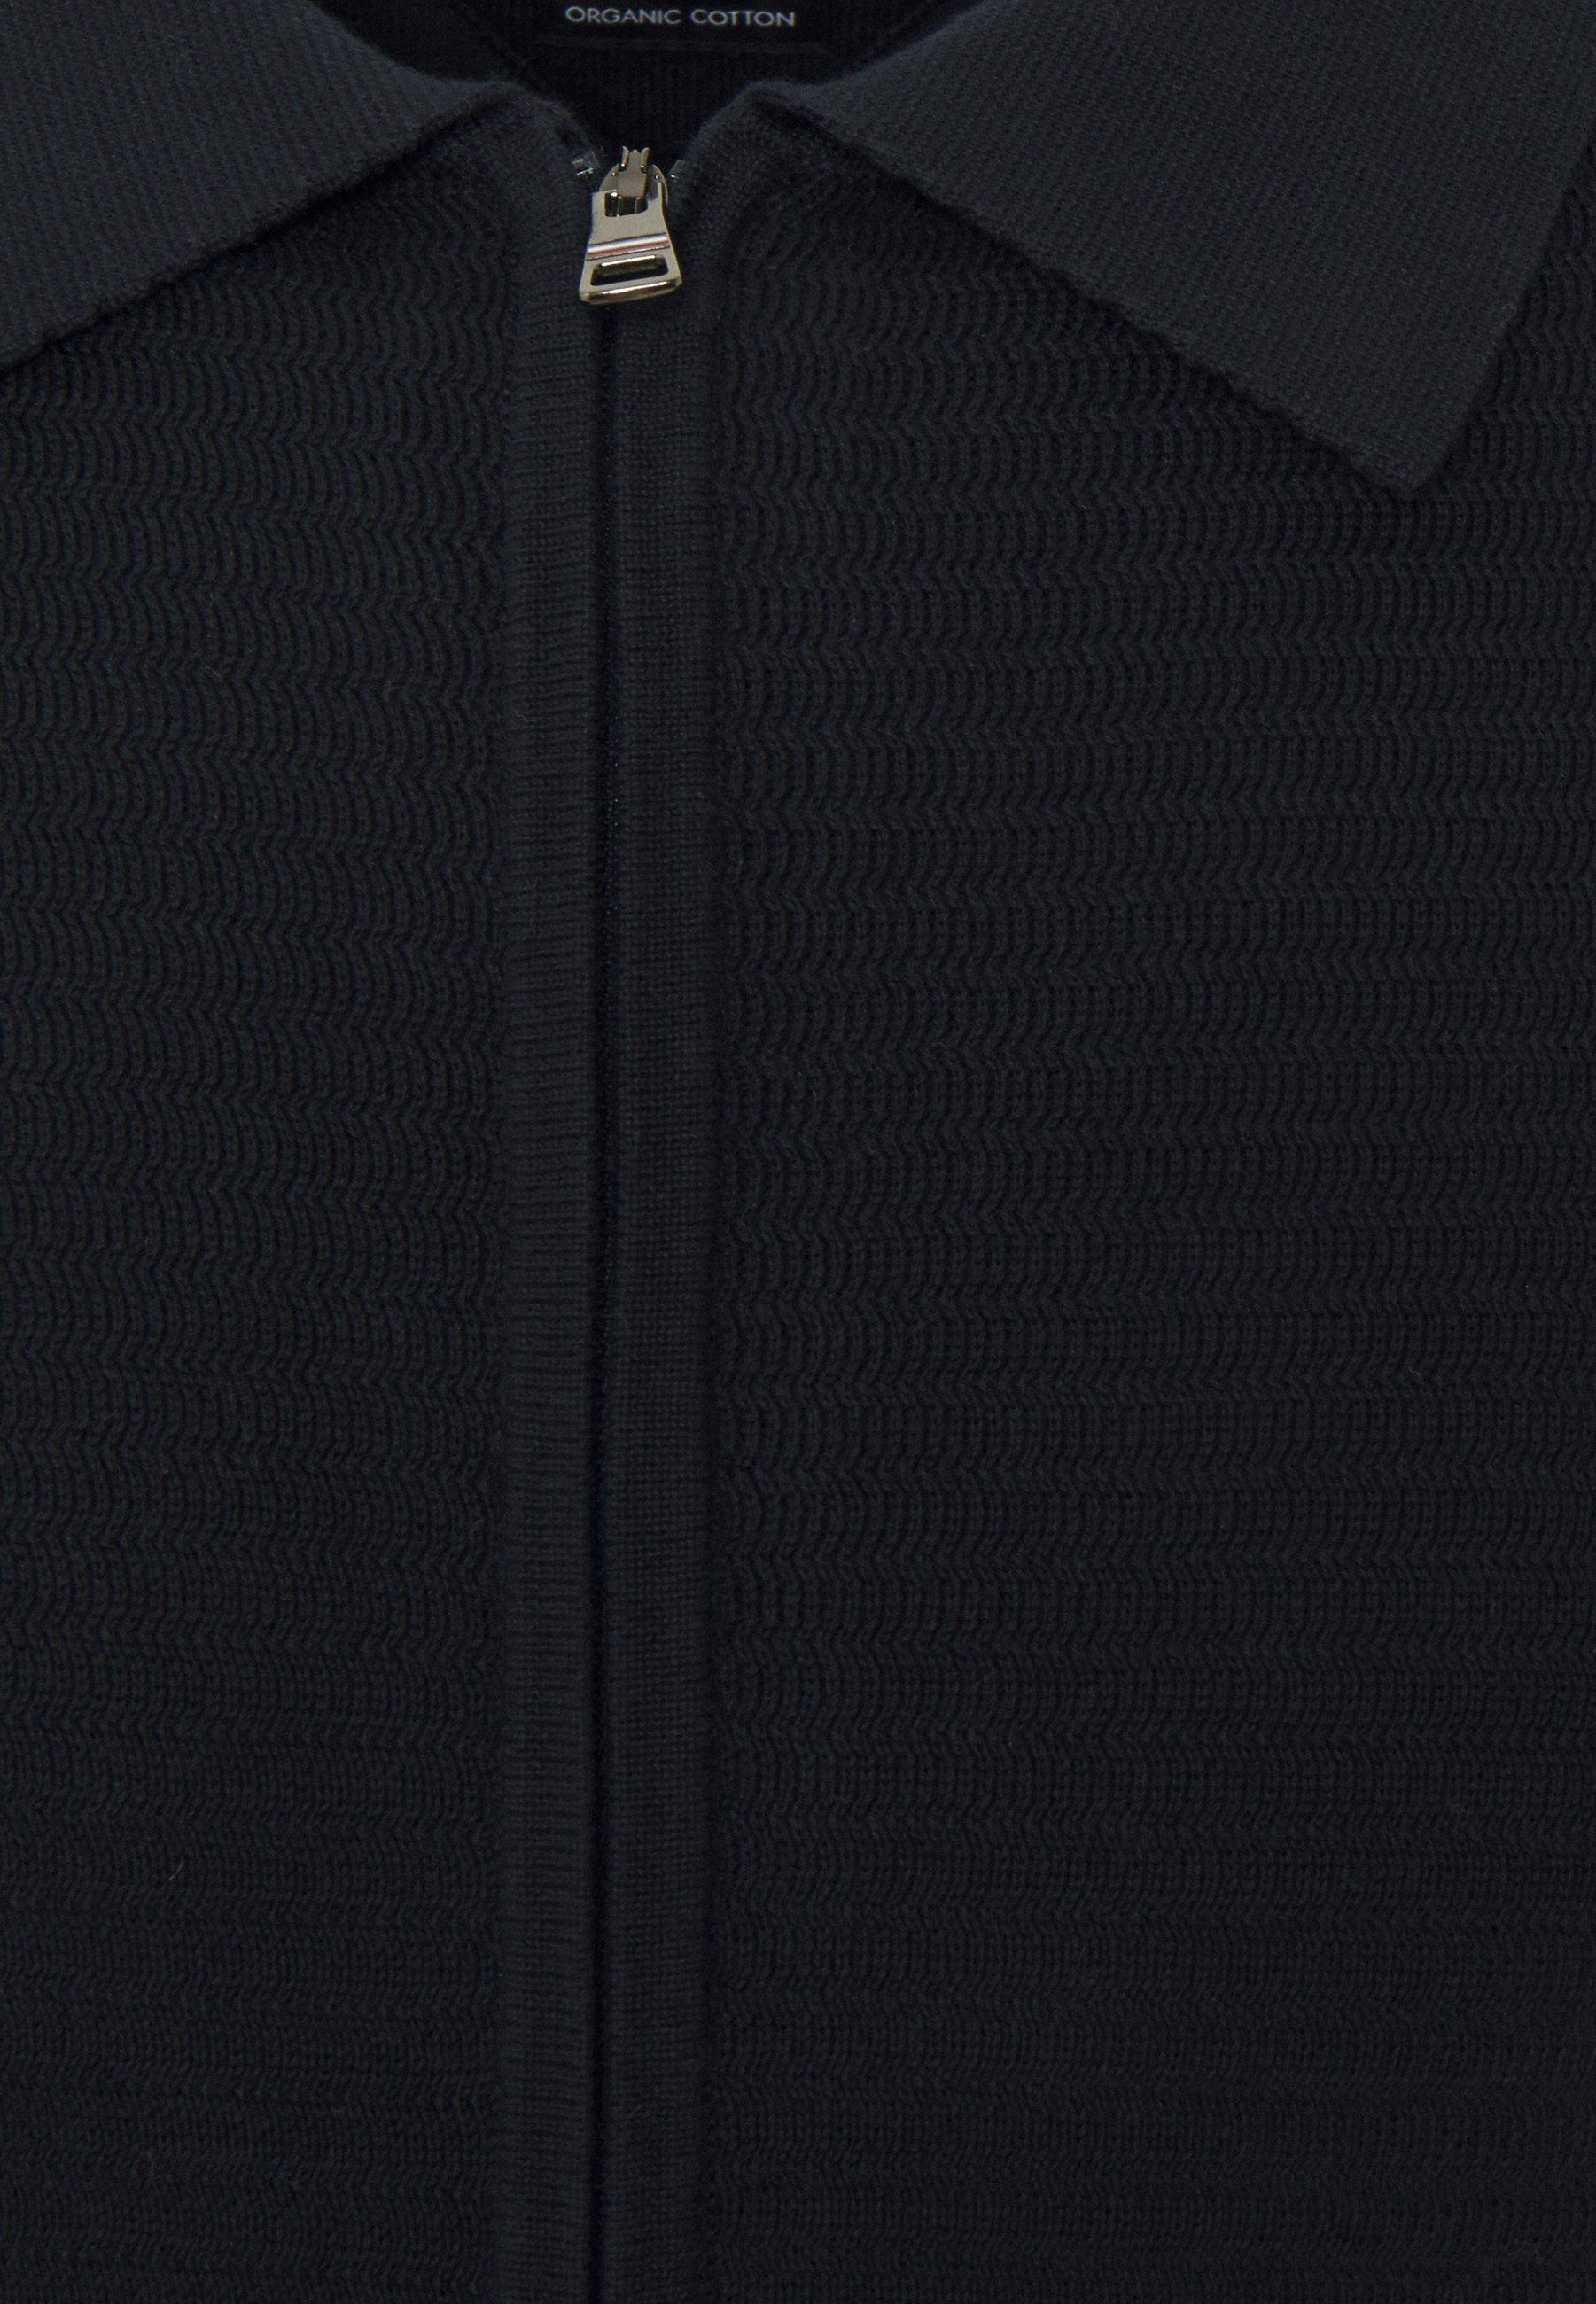 Homme FINE ZIG ZAG STRUCTURE OVERSHIRT - Gilet